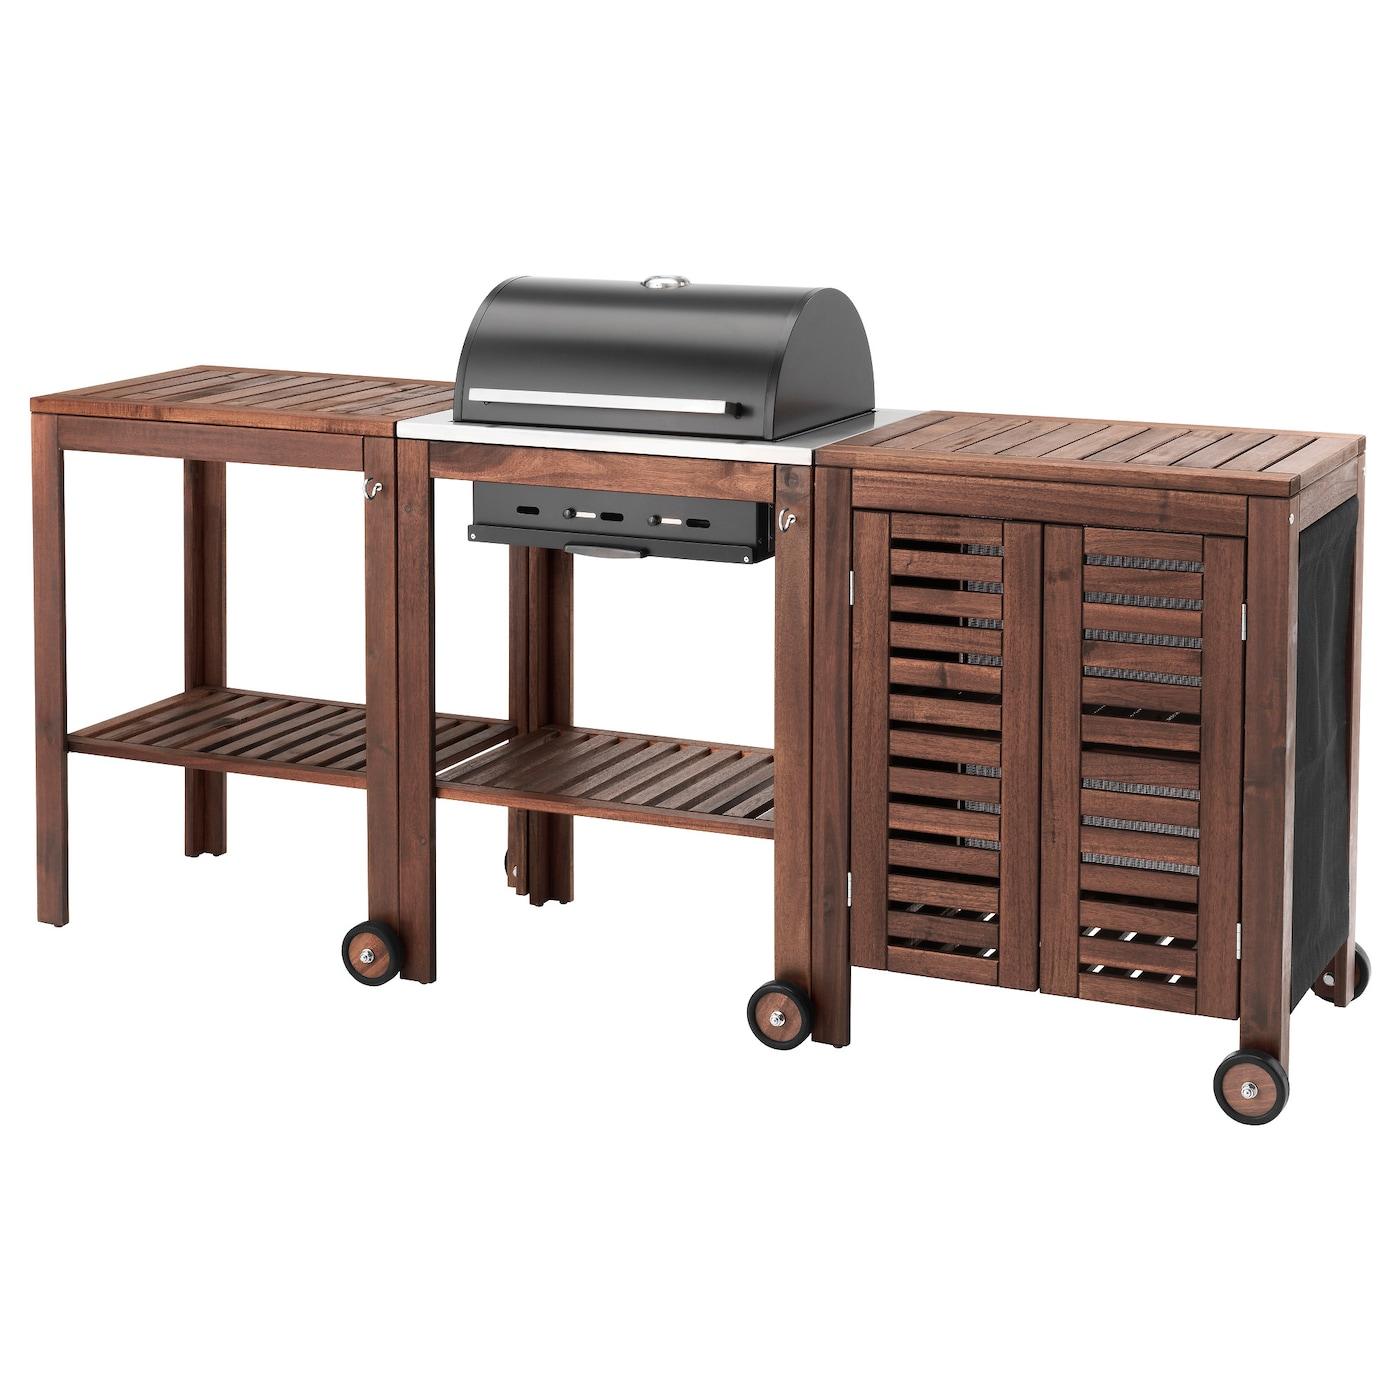 Pplar klasen charcoal barbecue w trolley cabinet brown - Tavolino esterno ikea ...